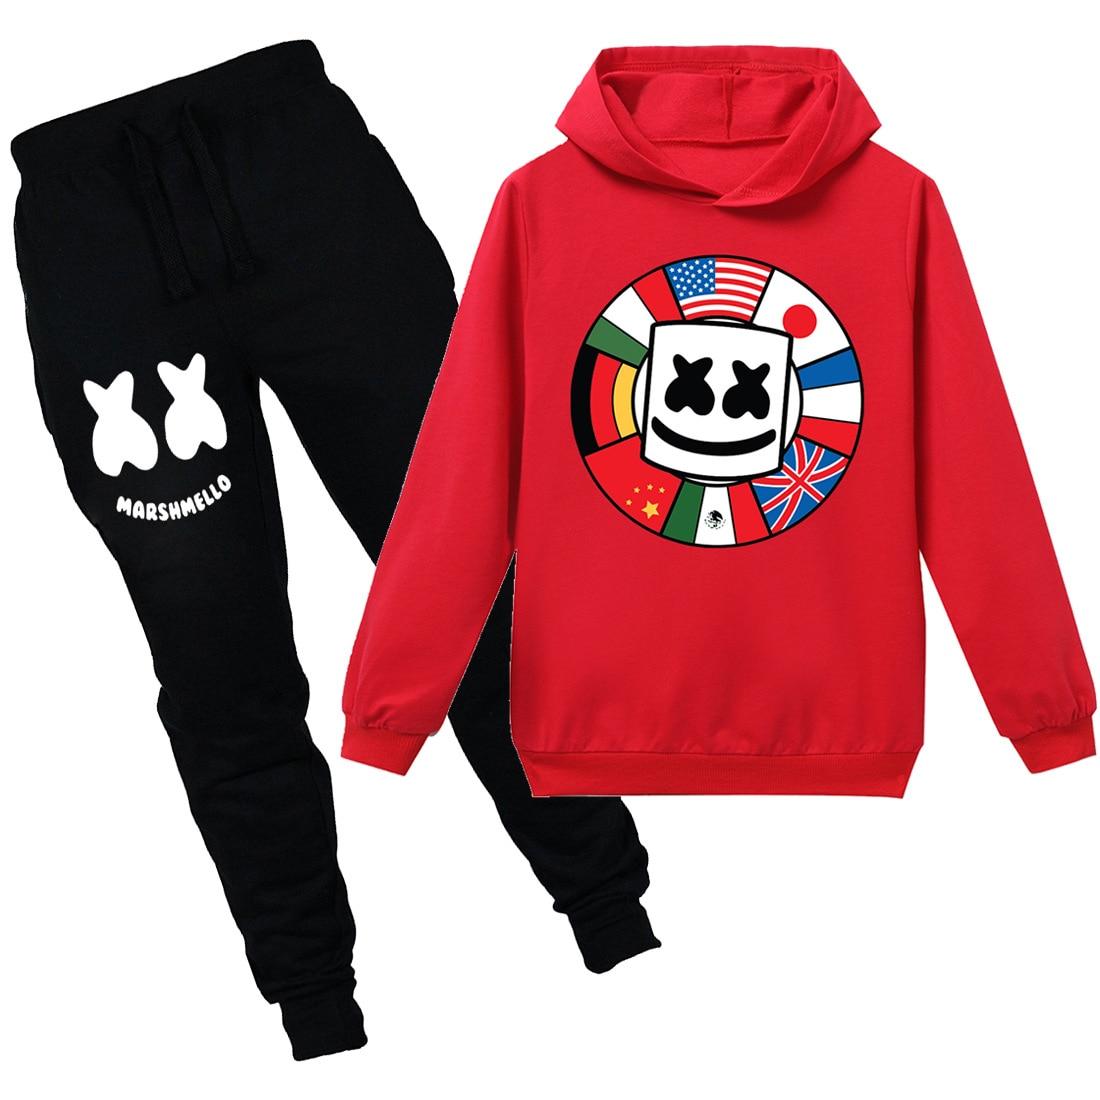 75e56d4d5 DJ Music Marshmello Fashion Children Hoodie Set New Boys Girls Clothes  Casual Tops Cotton ajax 2018